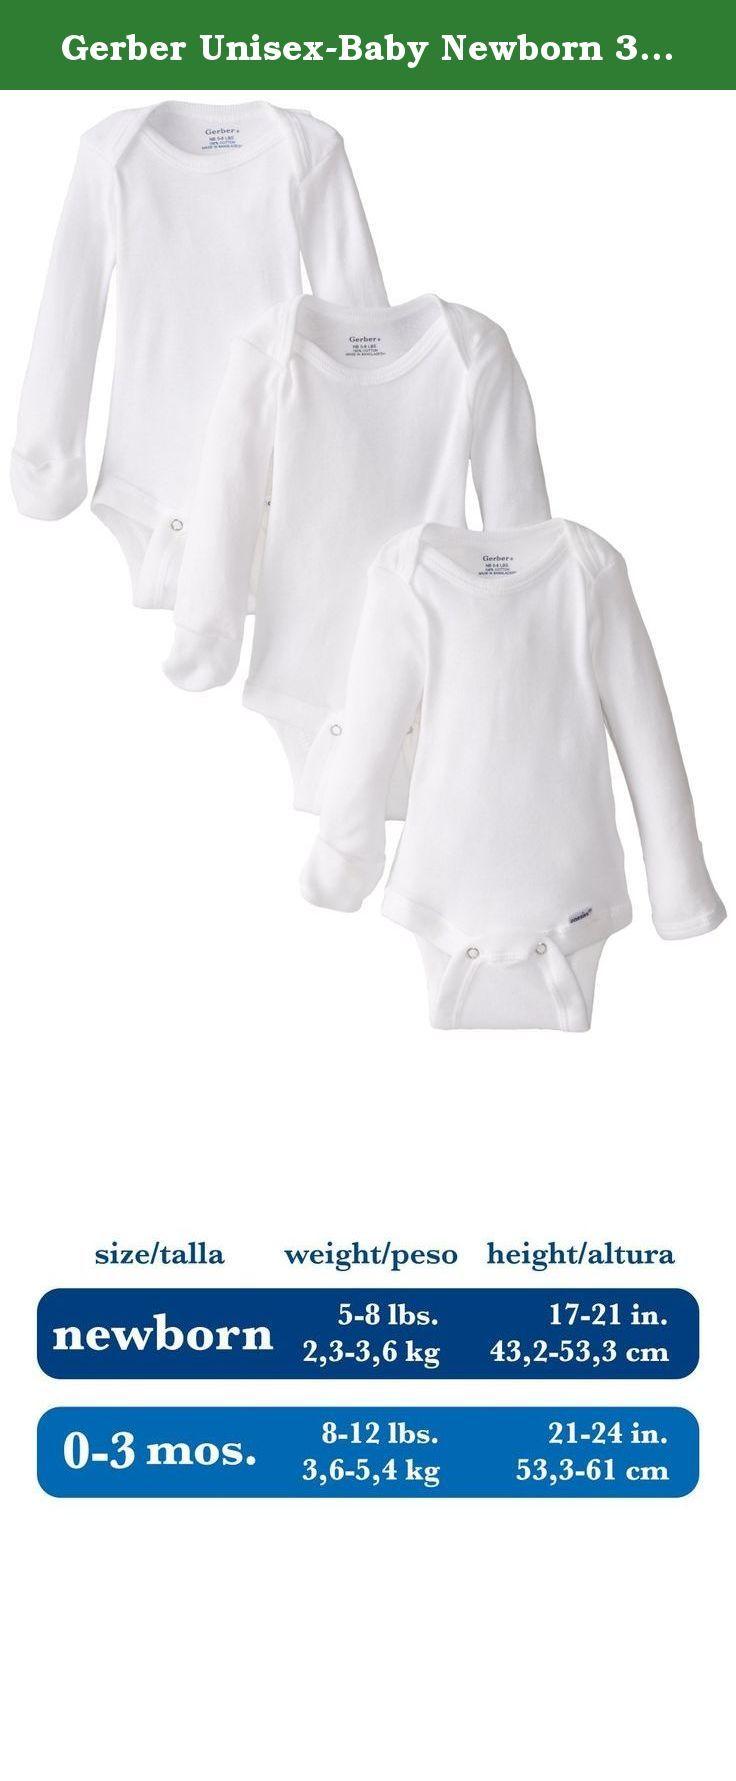 33008c93819c Gerber Unisex-Baby Newborn 3 Pack Longsleeve Mitten Cuff Onesies Brand